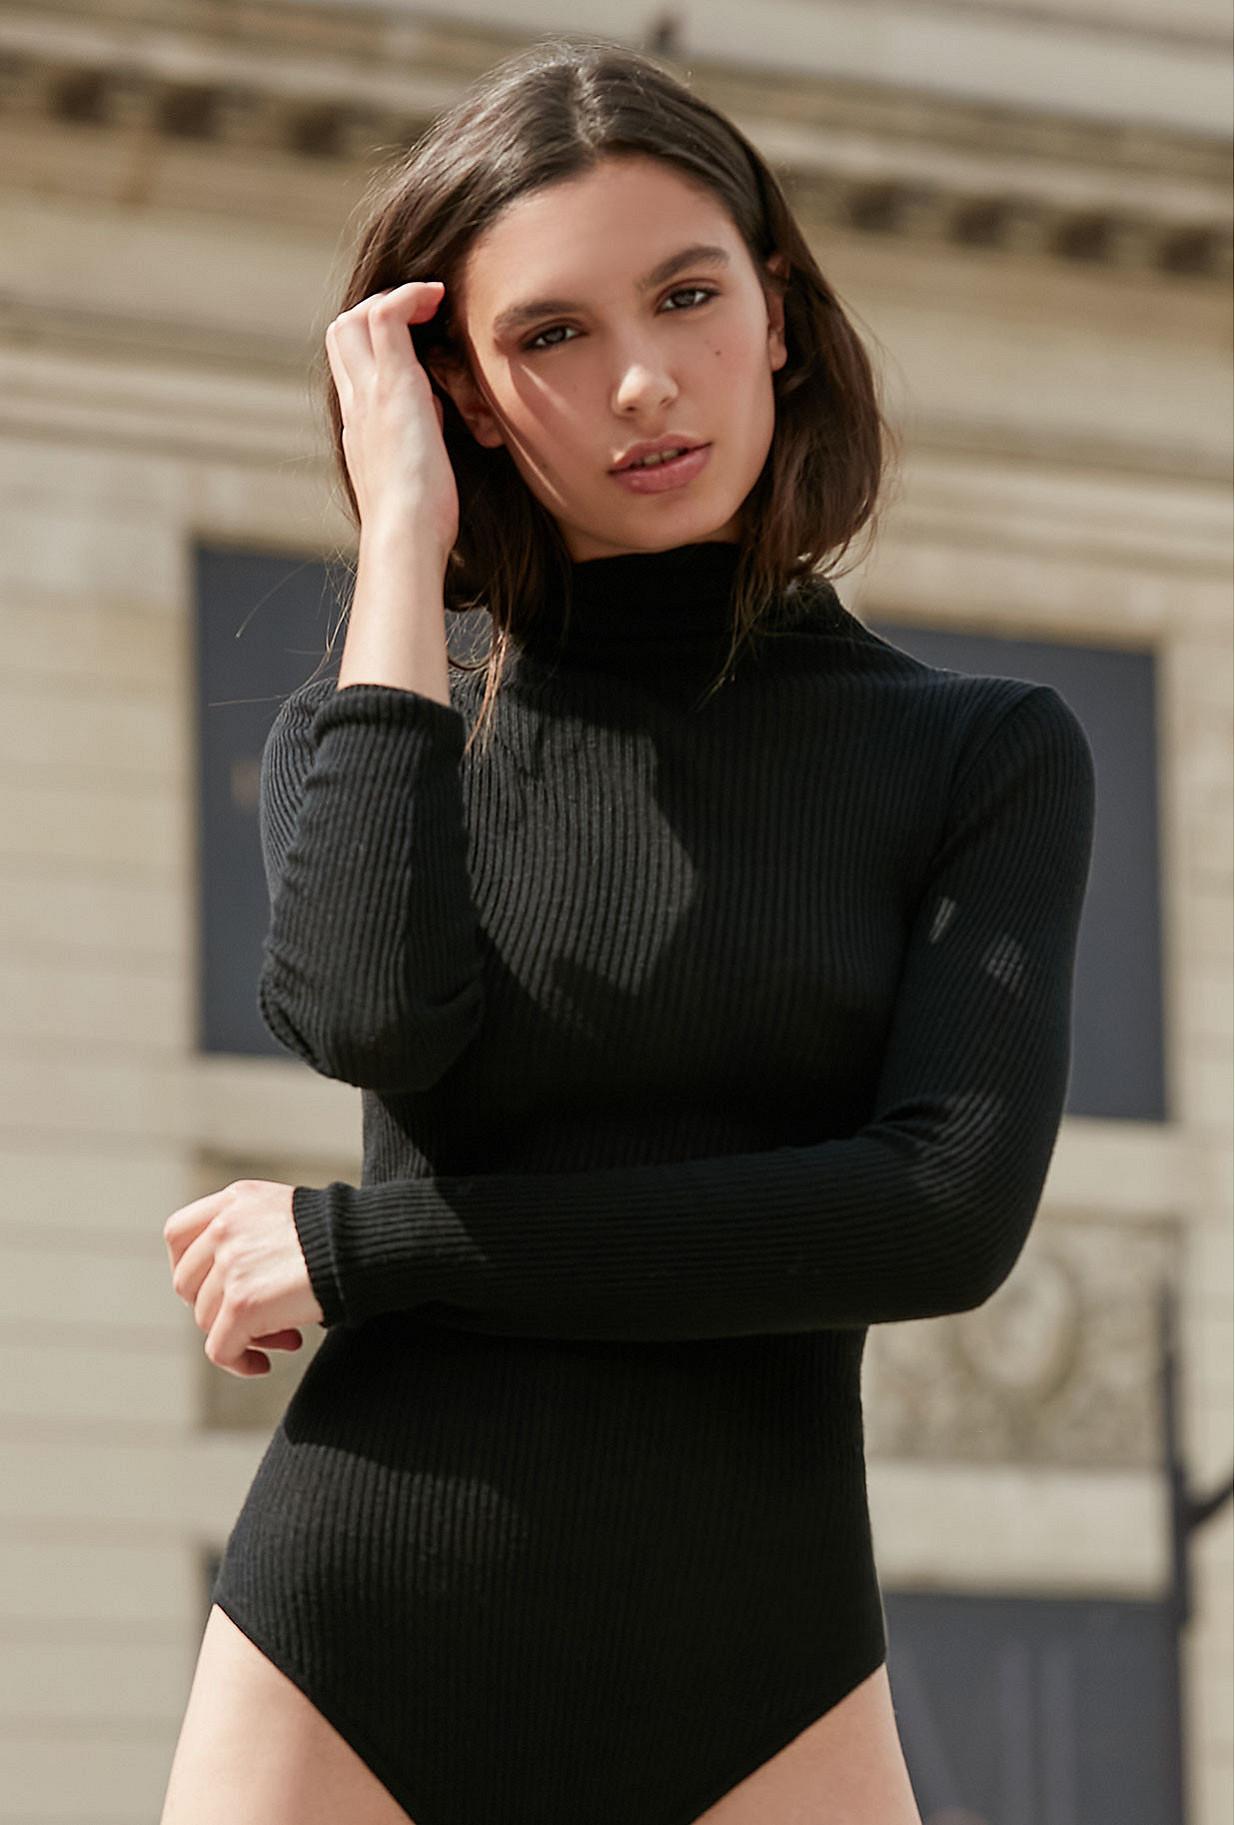 Black  Body  Smith Mes demoiselles fashion clothes designer Paris